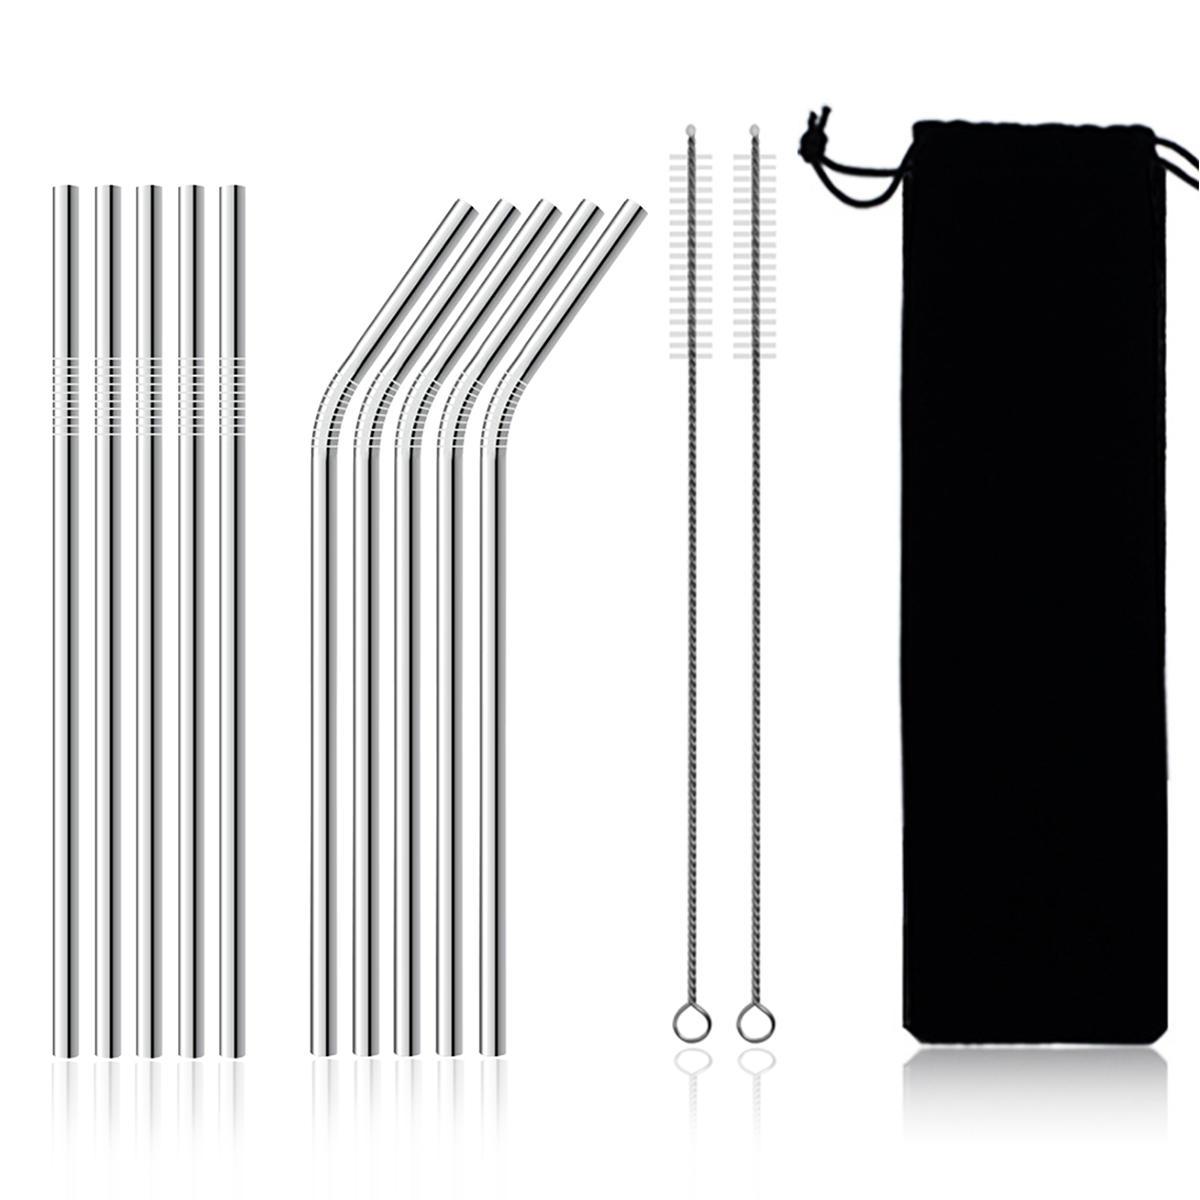 11Pcs Stainless Steel Metal Drinking Straw Reusable Straws